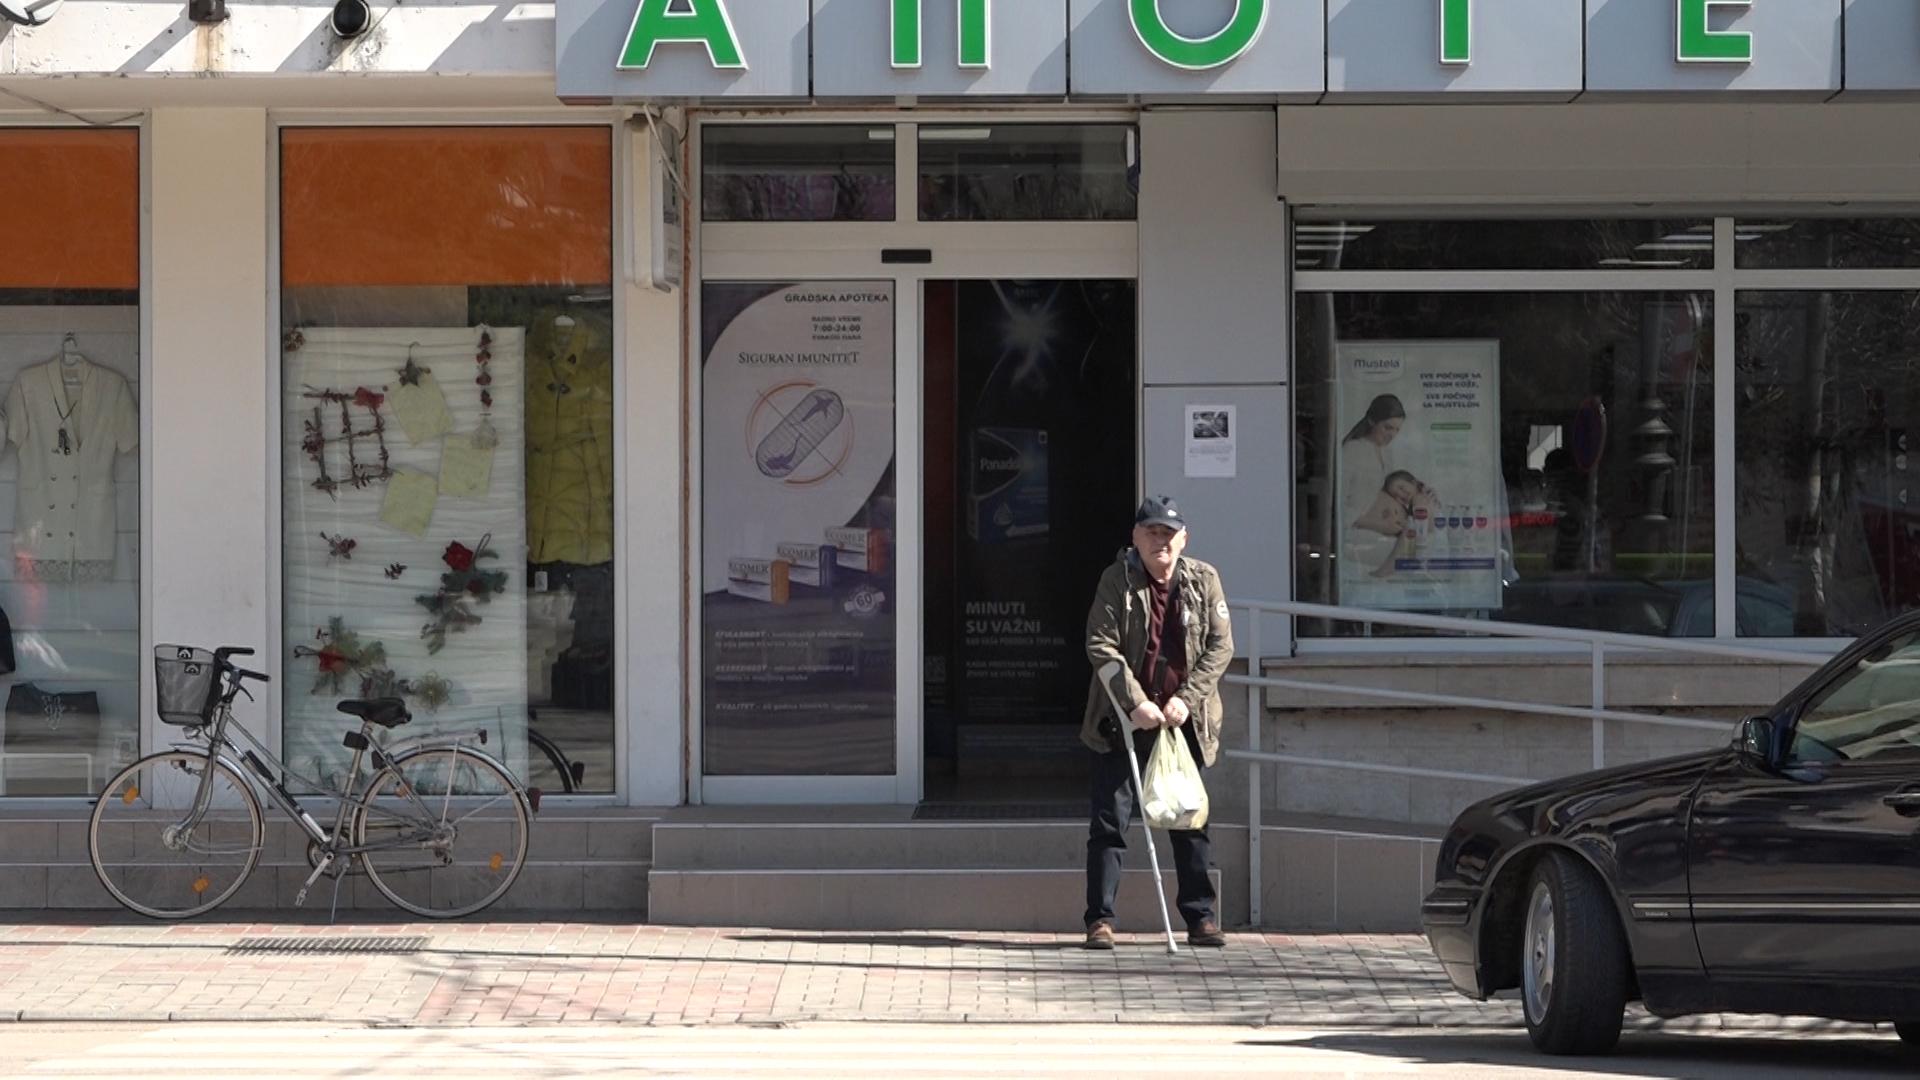 Narednih dana pomoć najstarijim sugrađanima preko kol centra najavilo Ministarstvo unutrašnjih poslova